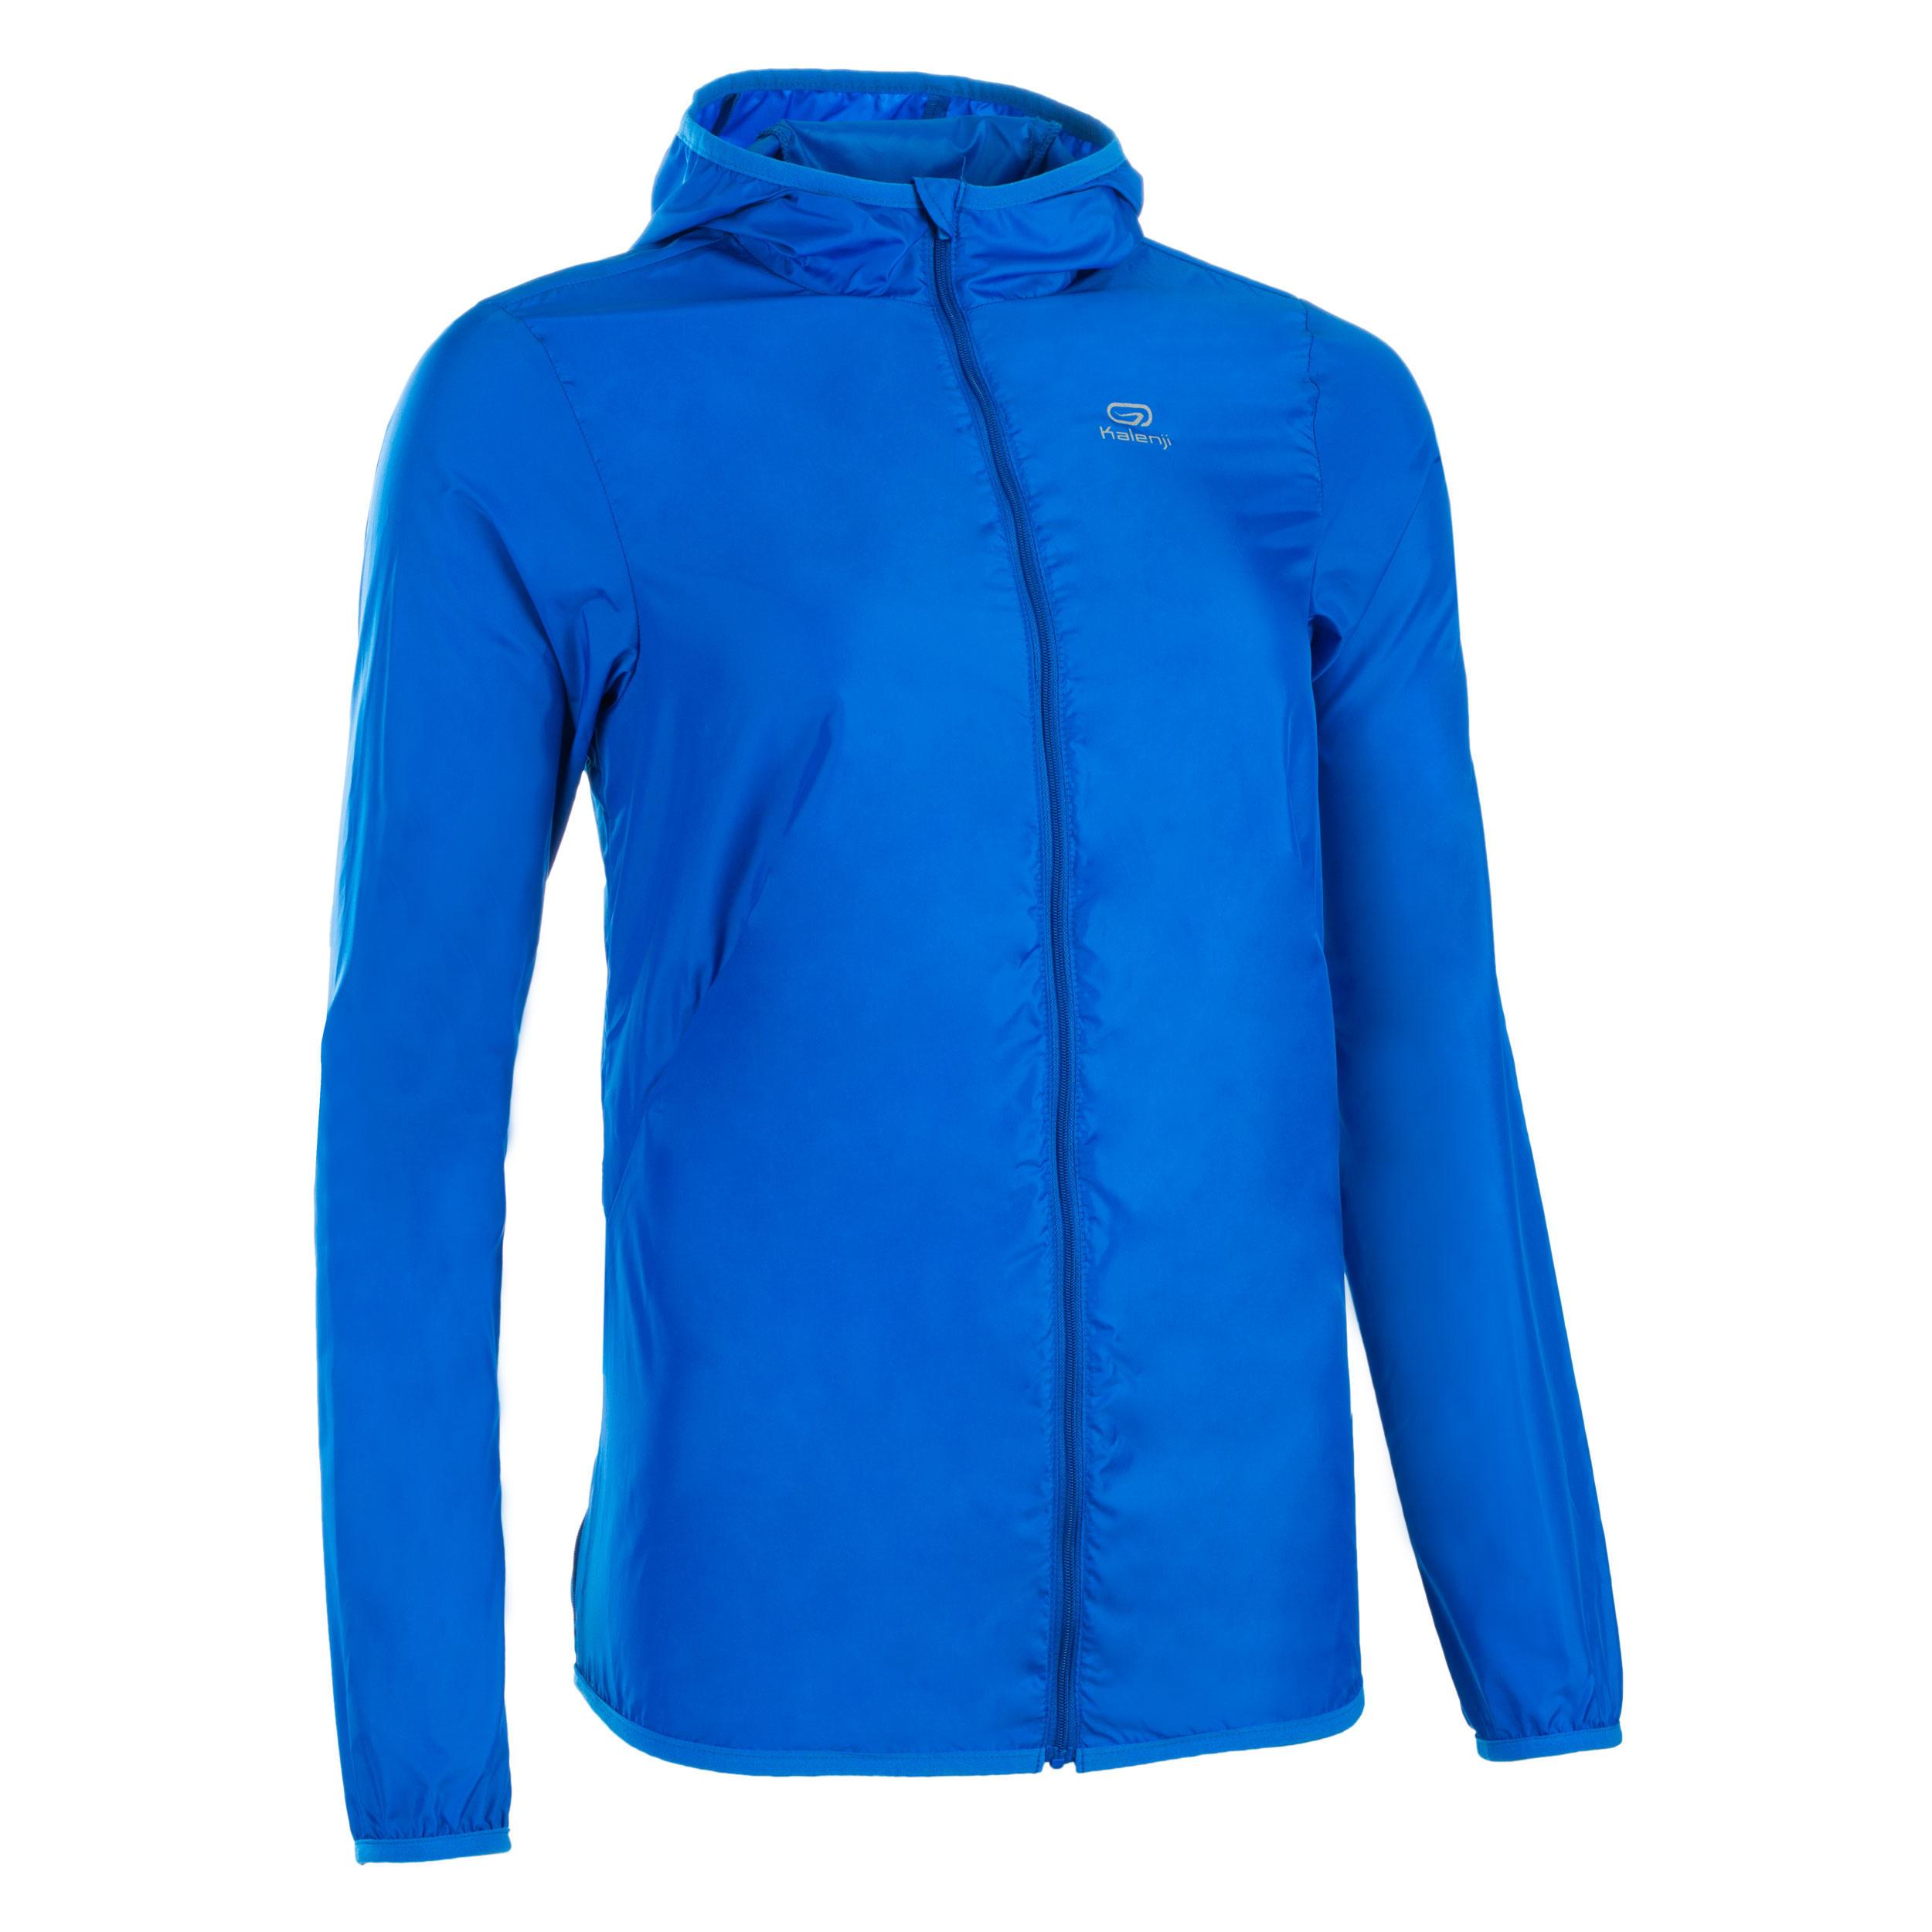 Jachetă vânt atletism Damă imagine produs